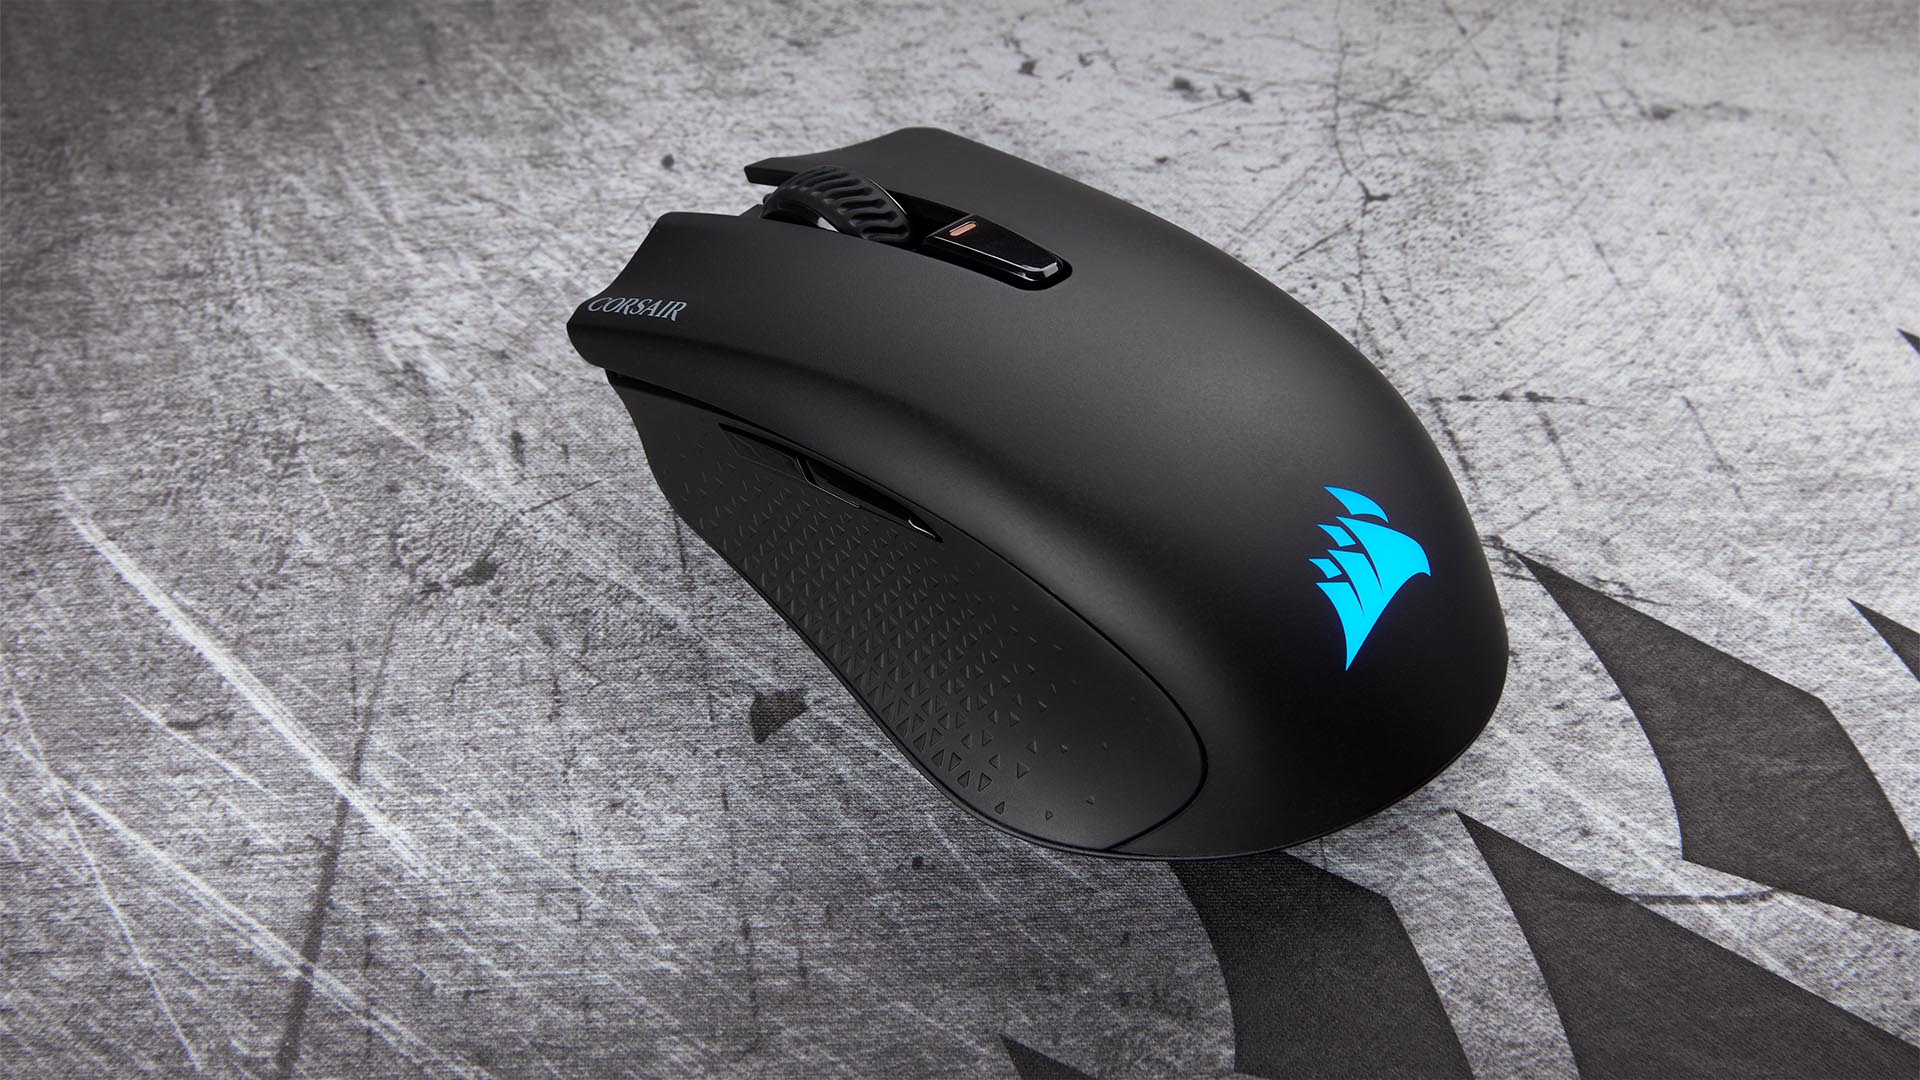 Corsair Harpoon RGB Wireless: best cheap wireless gaming mouse